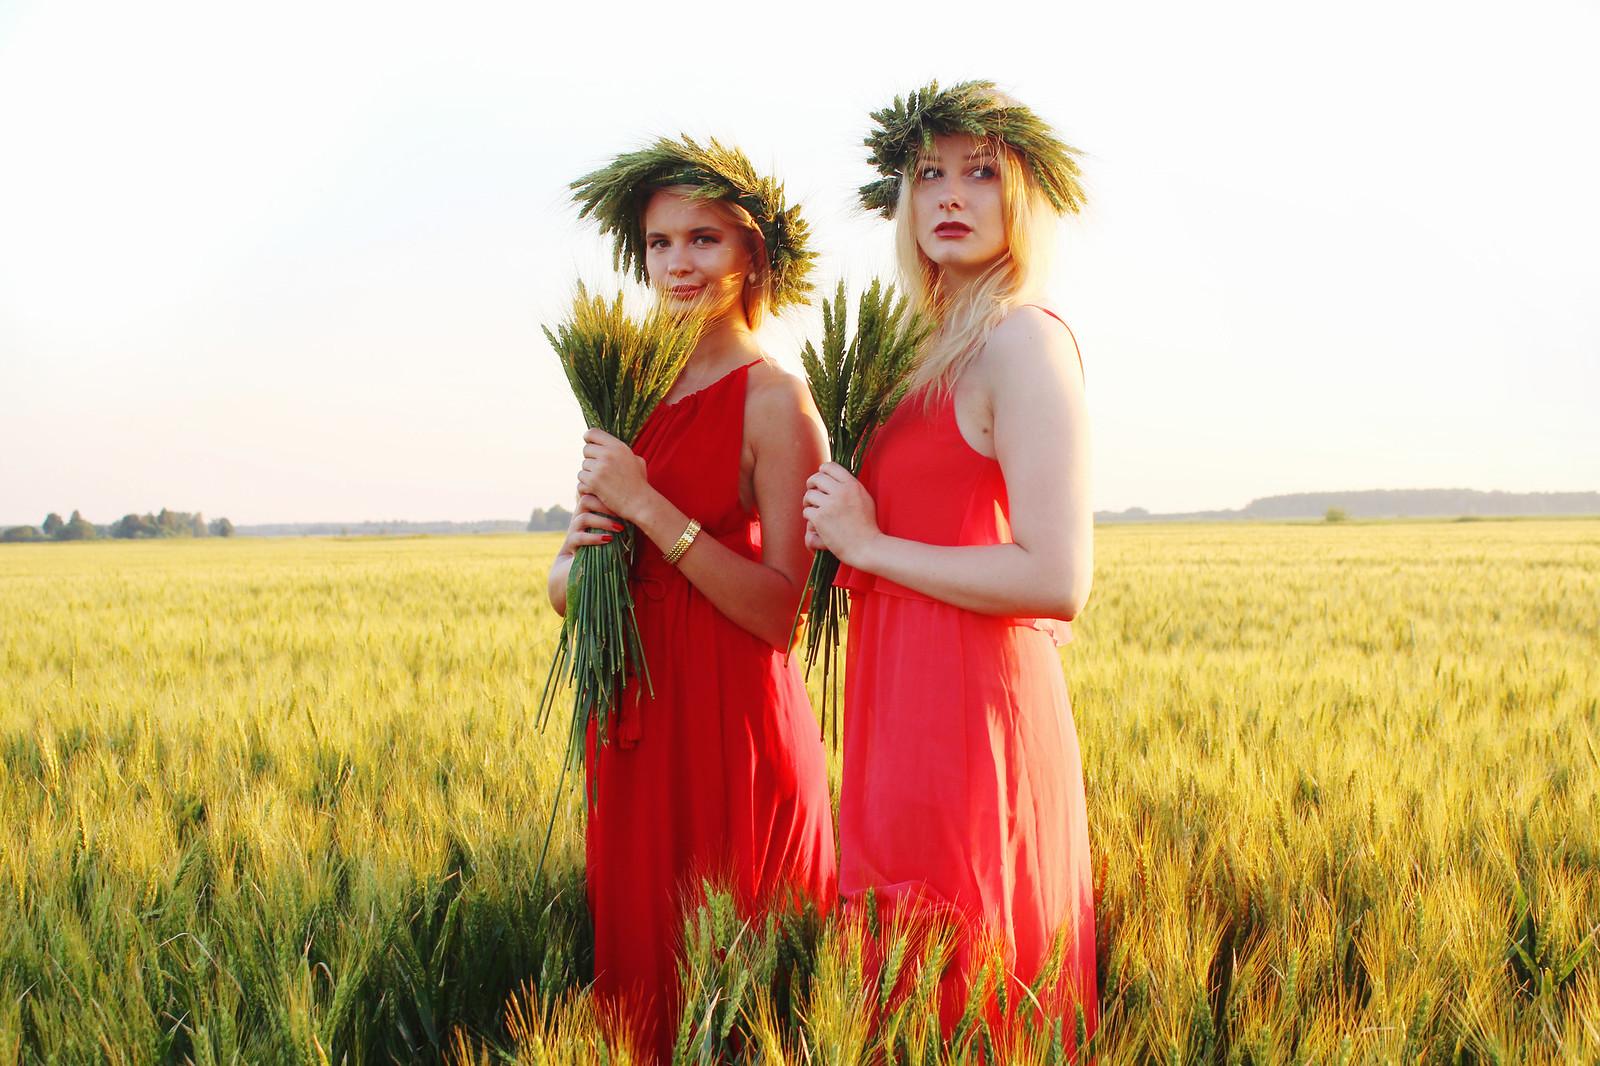 Latvian girls with flower wreaths